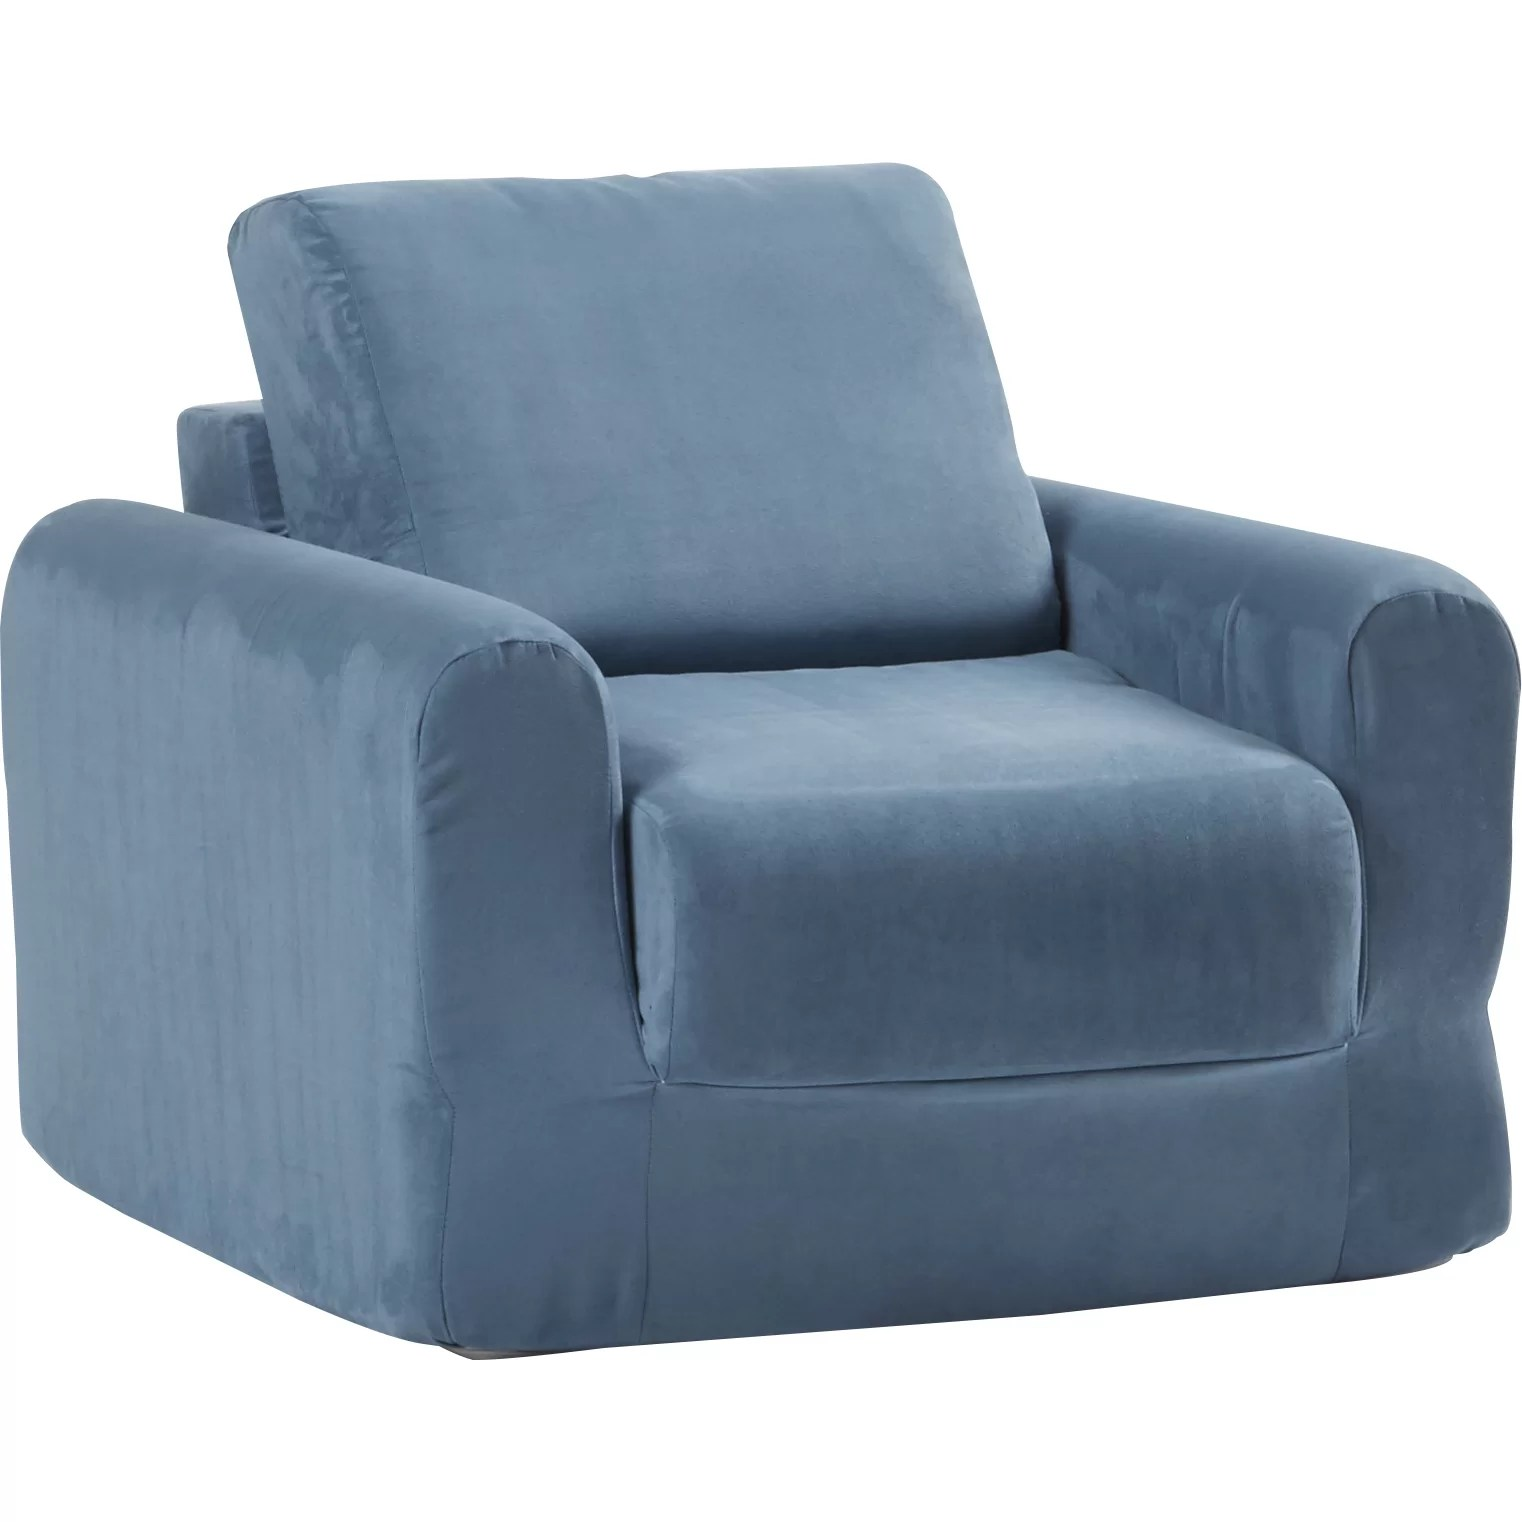 sleeper chair ikea adelaide covers fun furnishings child and reviews wayfair